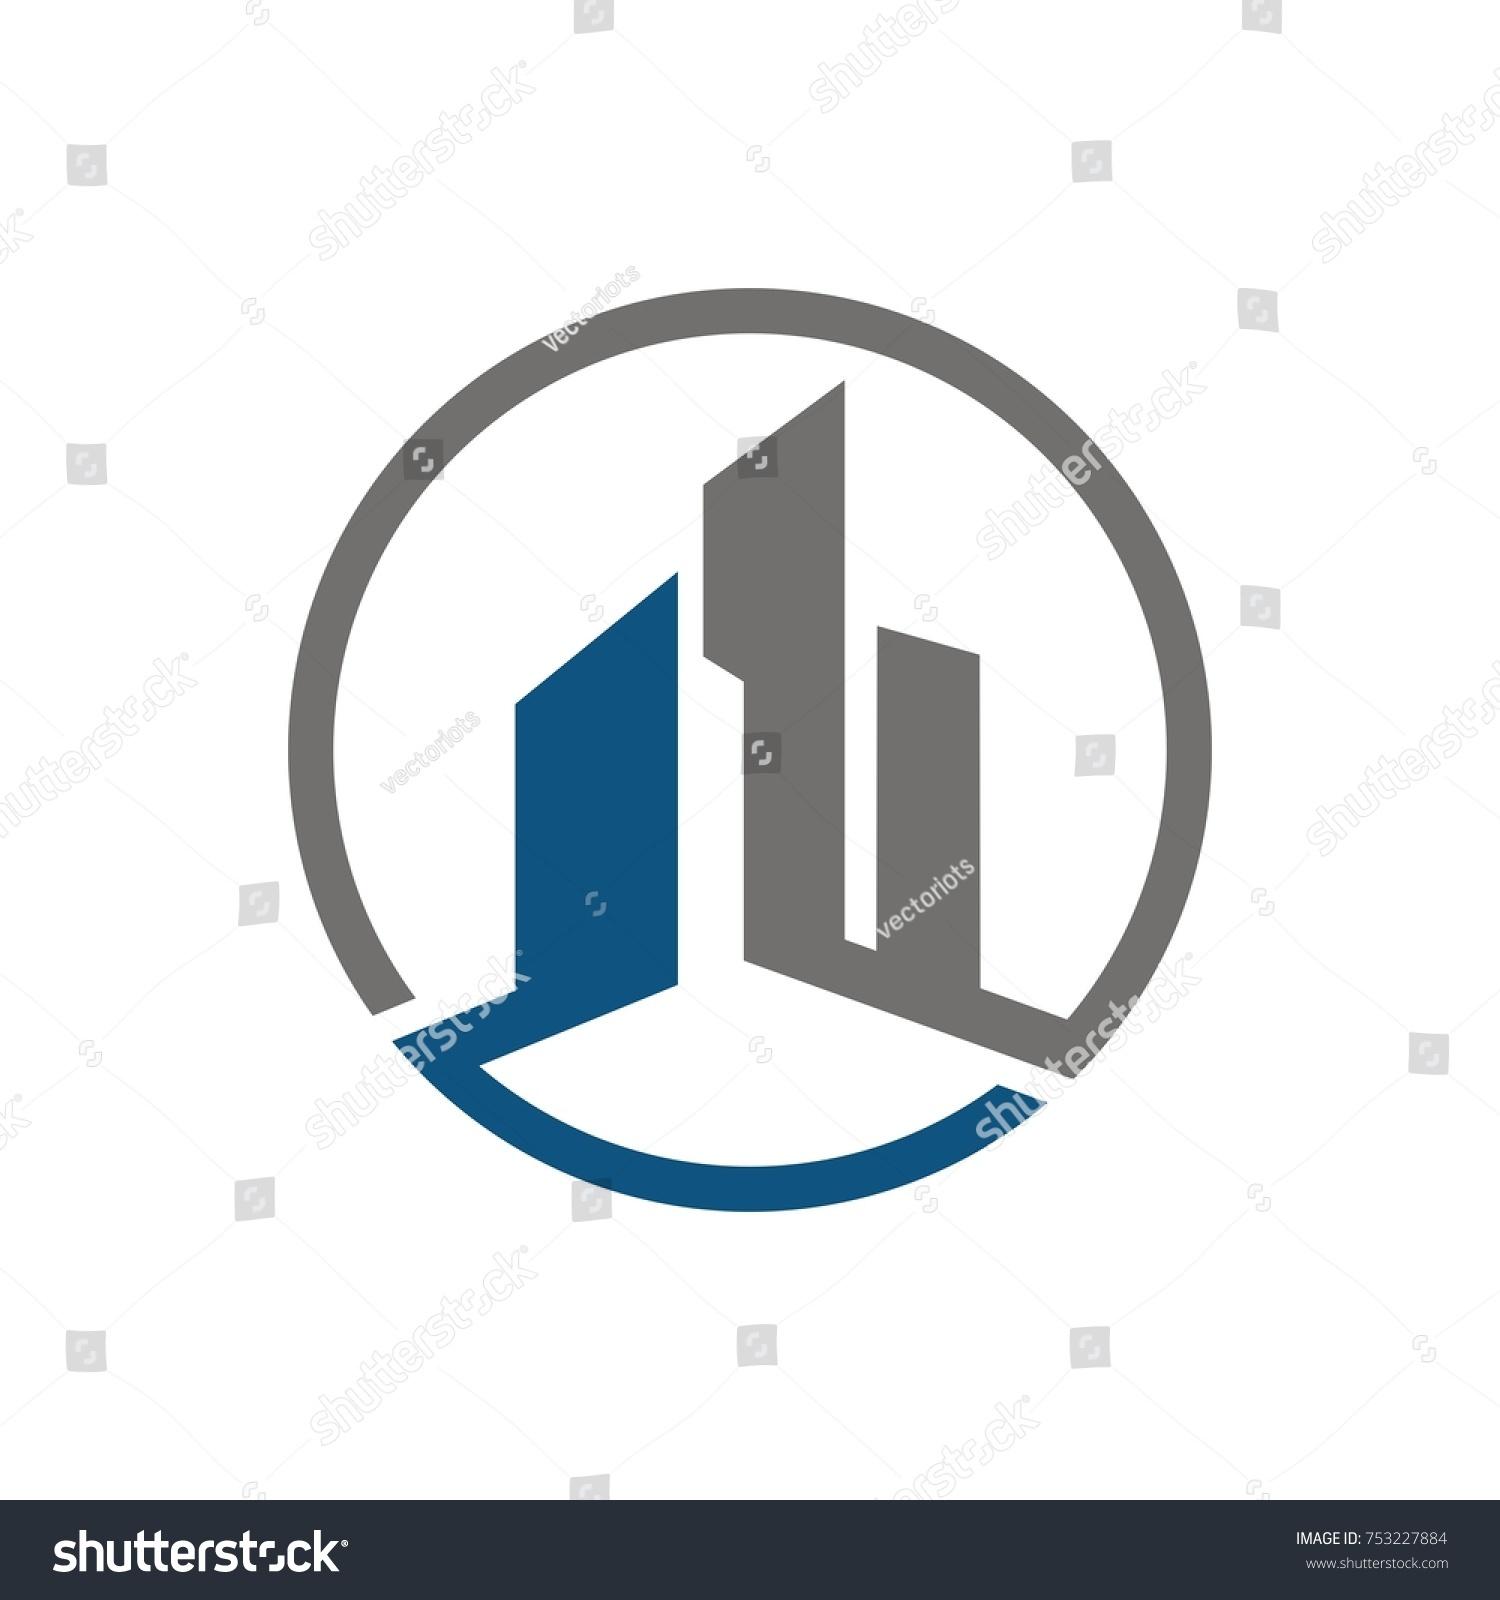 Real estate construction building logo design stock vector real estate construction building logo design template designed based in vector format biocorpaavc